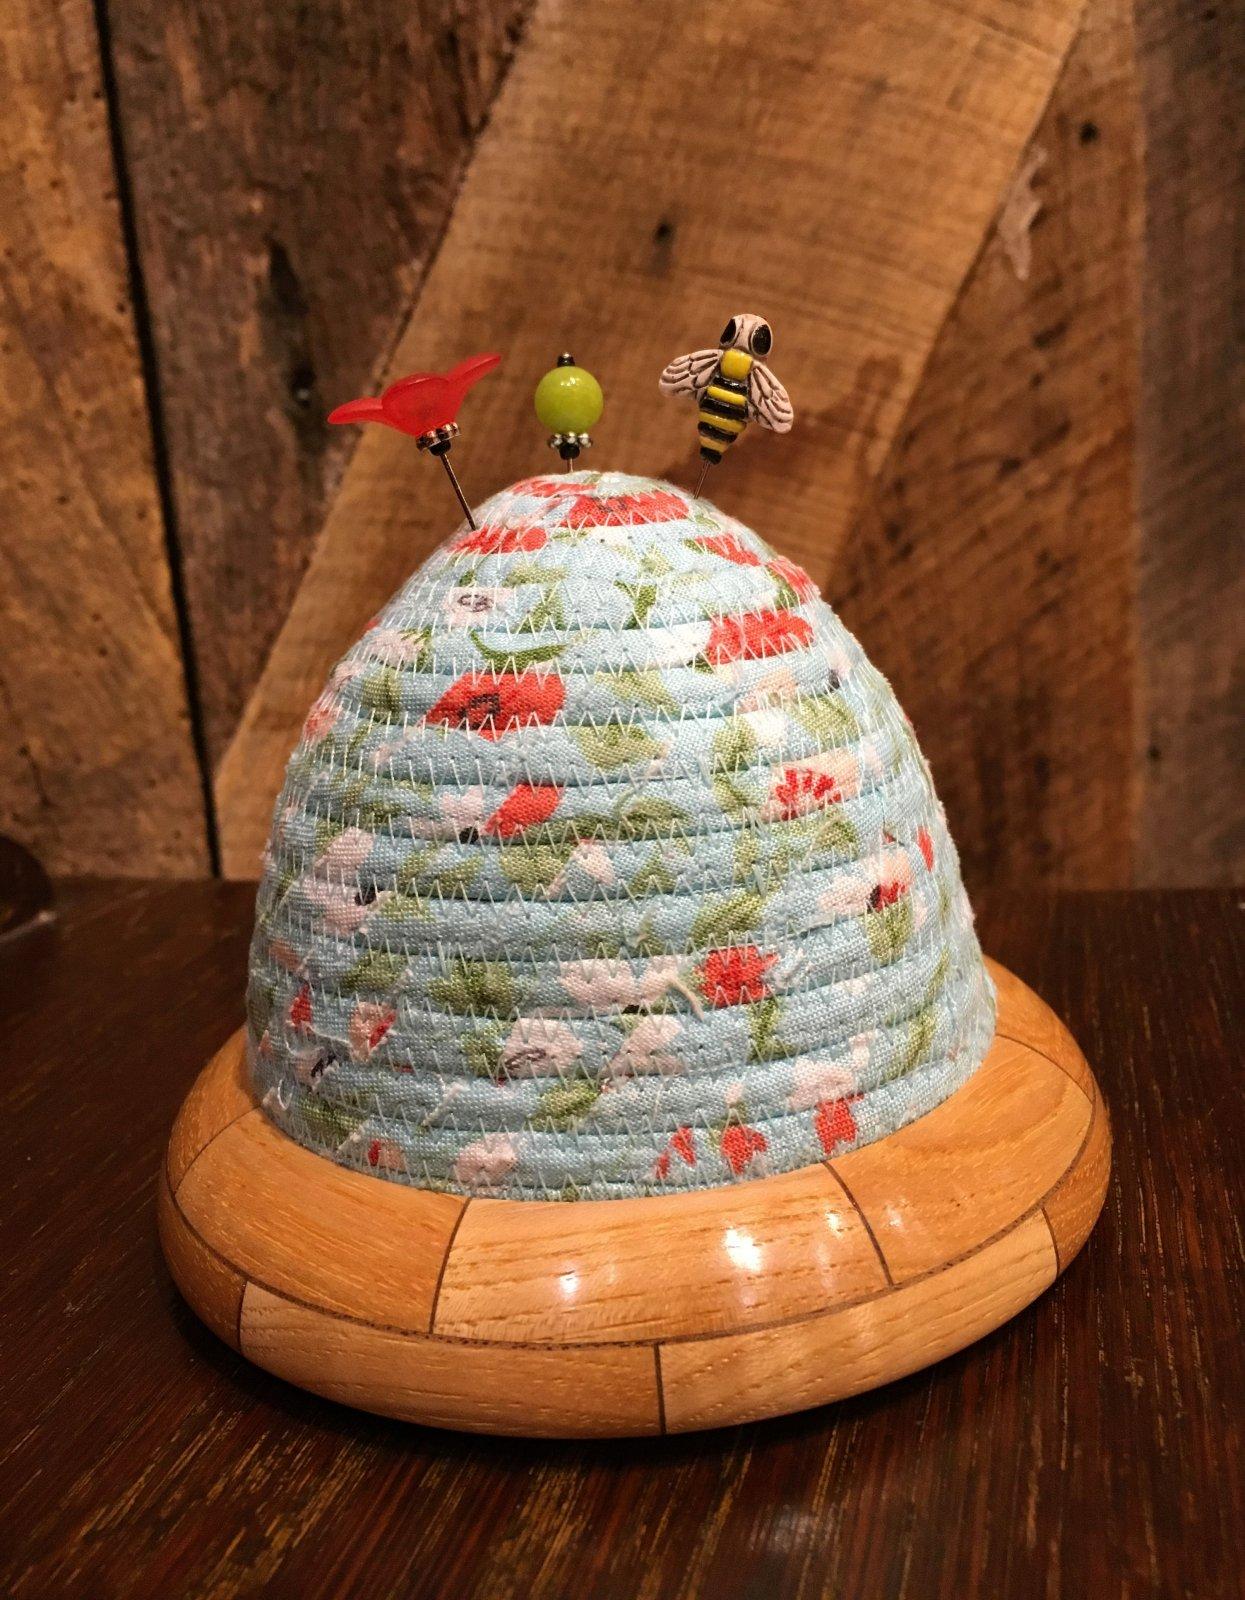 Beehive Pincushion - Hickory / Walnut Base - Blue Top